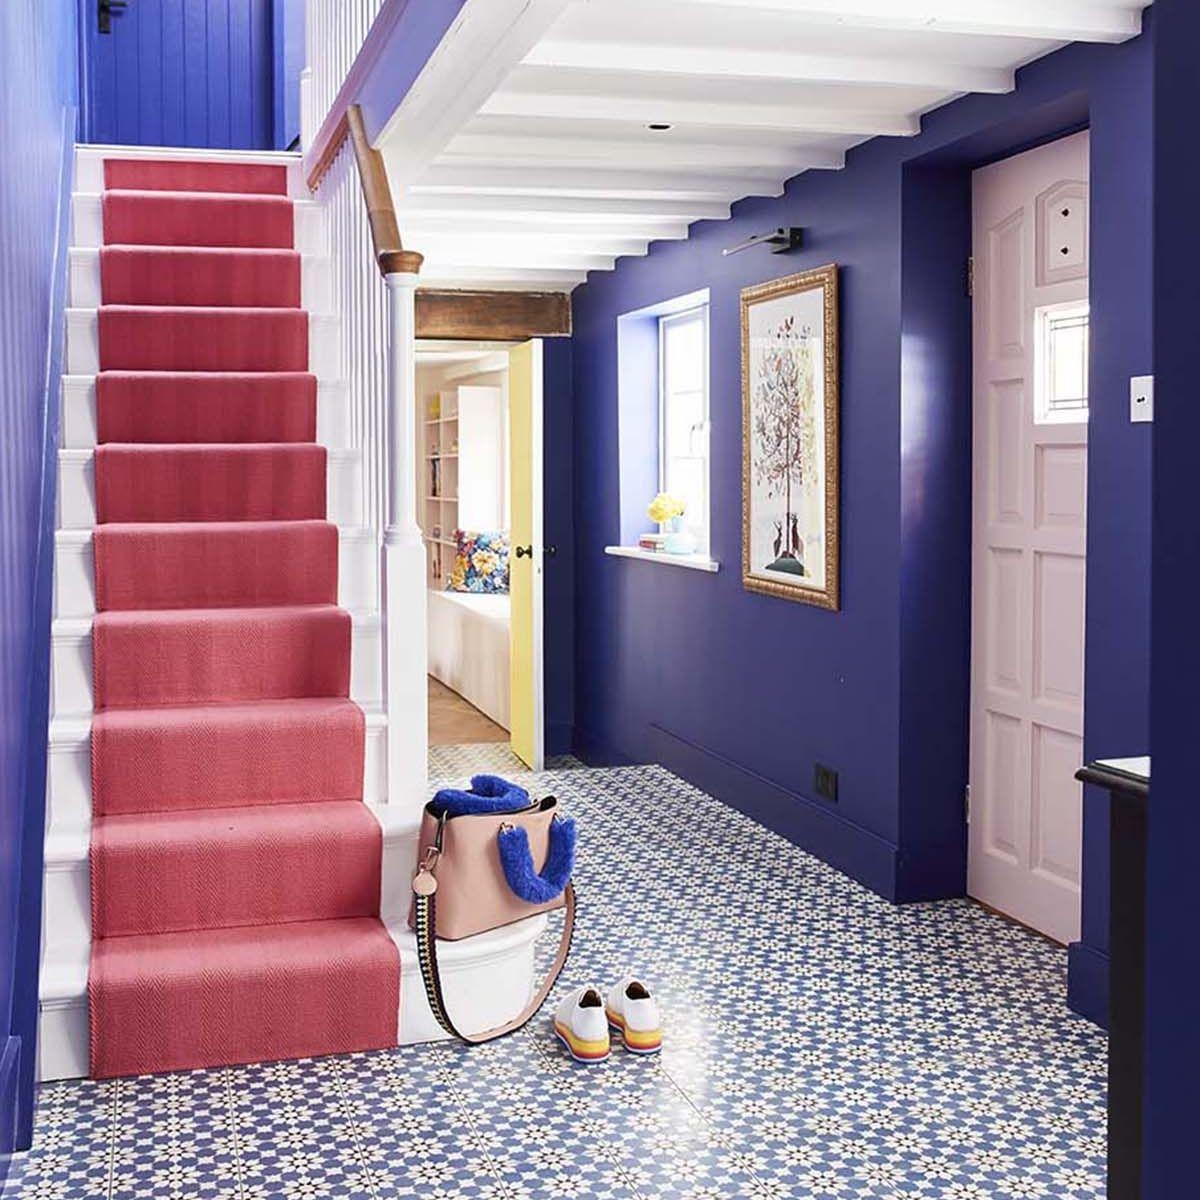 Lighting Basement Washroom Stairs: Sophie Robinson, Pink